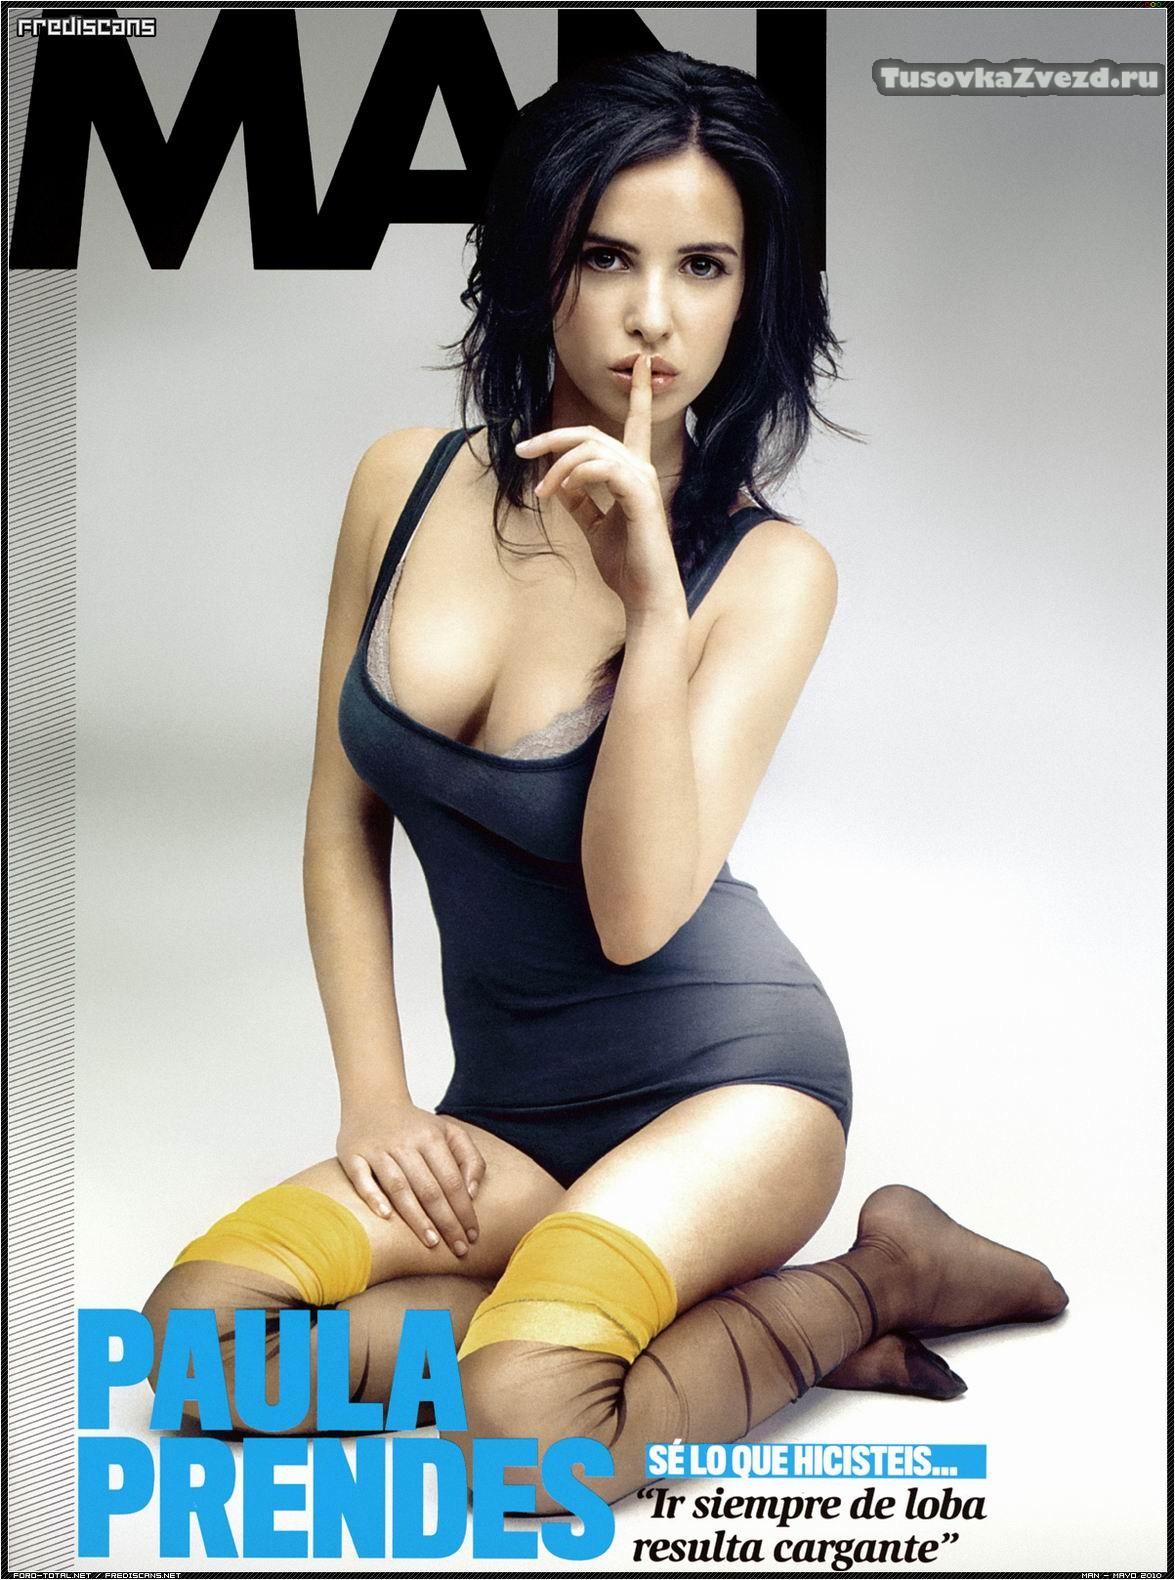 Паула Прендес (Paula Prendes) голая, фото сессия для журнала Man Испания, май 2010